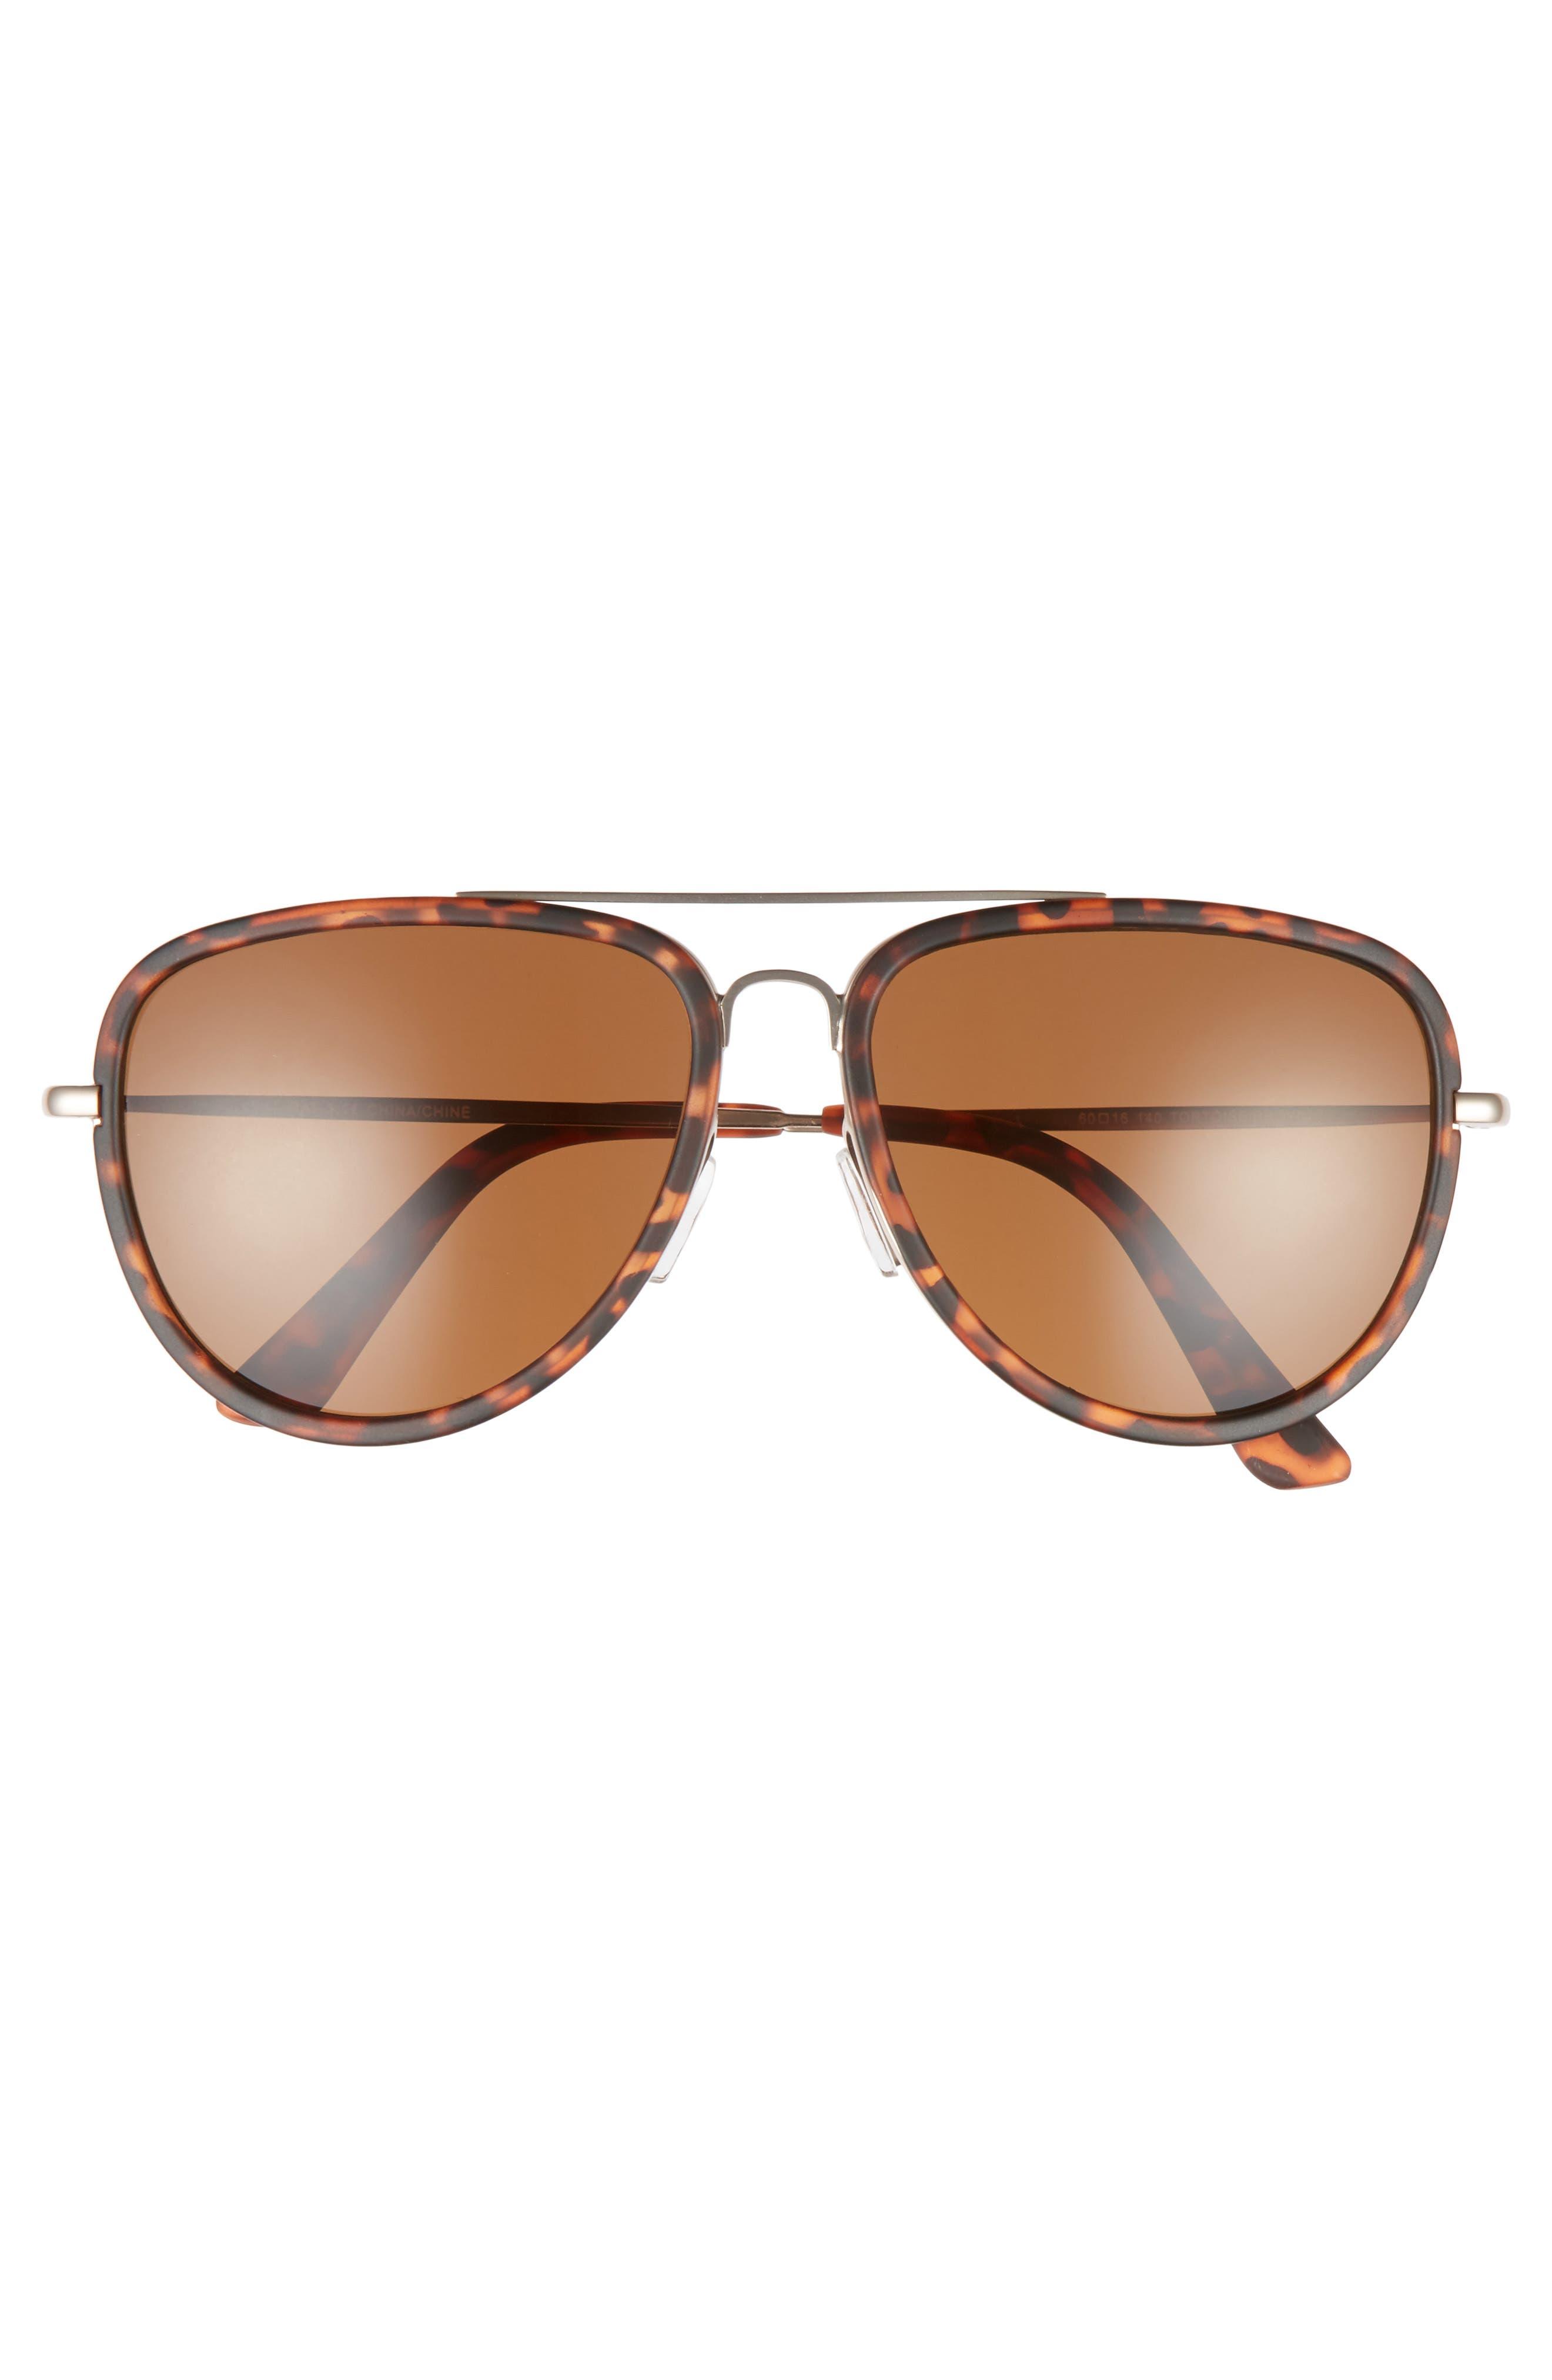 Pace 60mm Aviator Sunglasses,                             Alternate thumbnail 2, color,                             Tortoise/ Brown